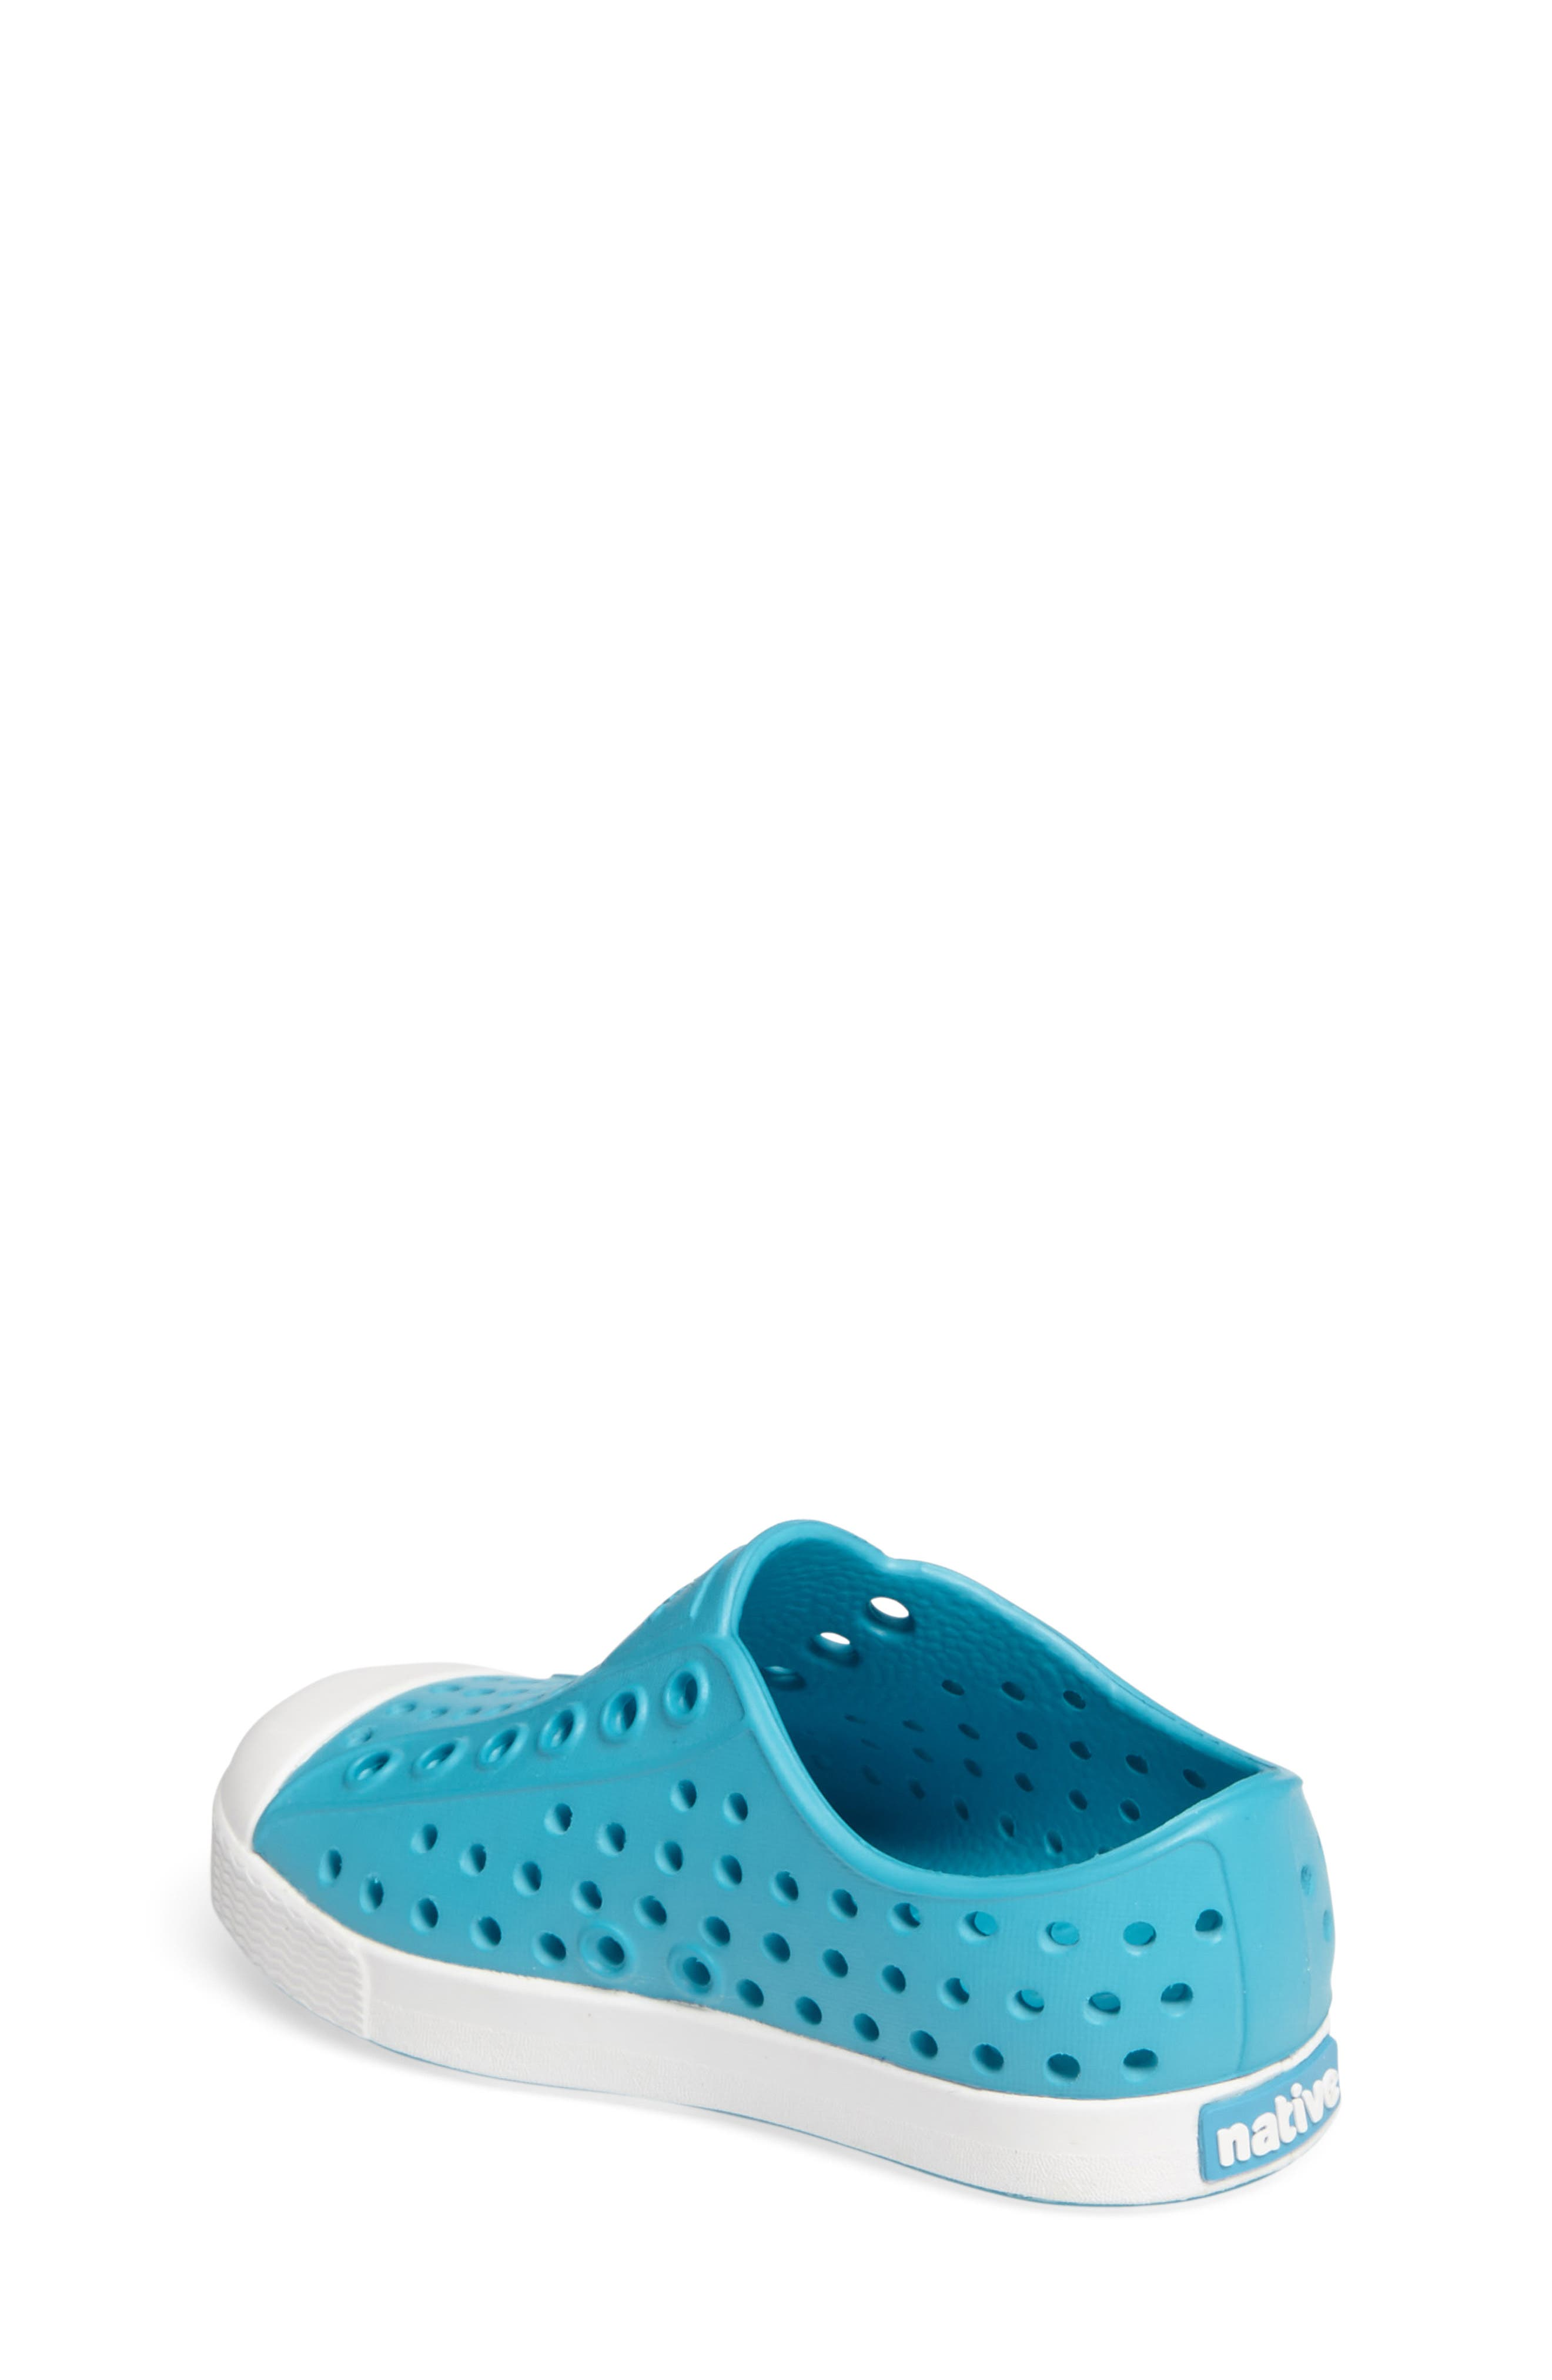 'Jefferson' Water Friendly Slip-On Sneaker,                             Alternate thumbnail 93, color,